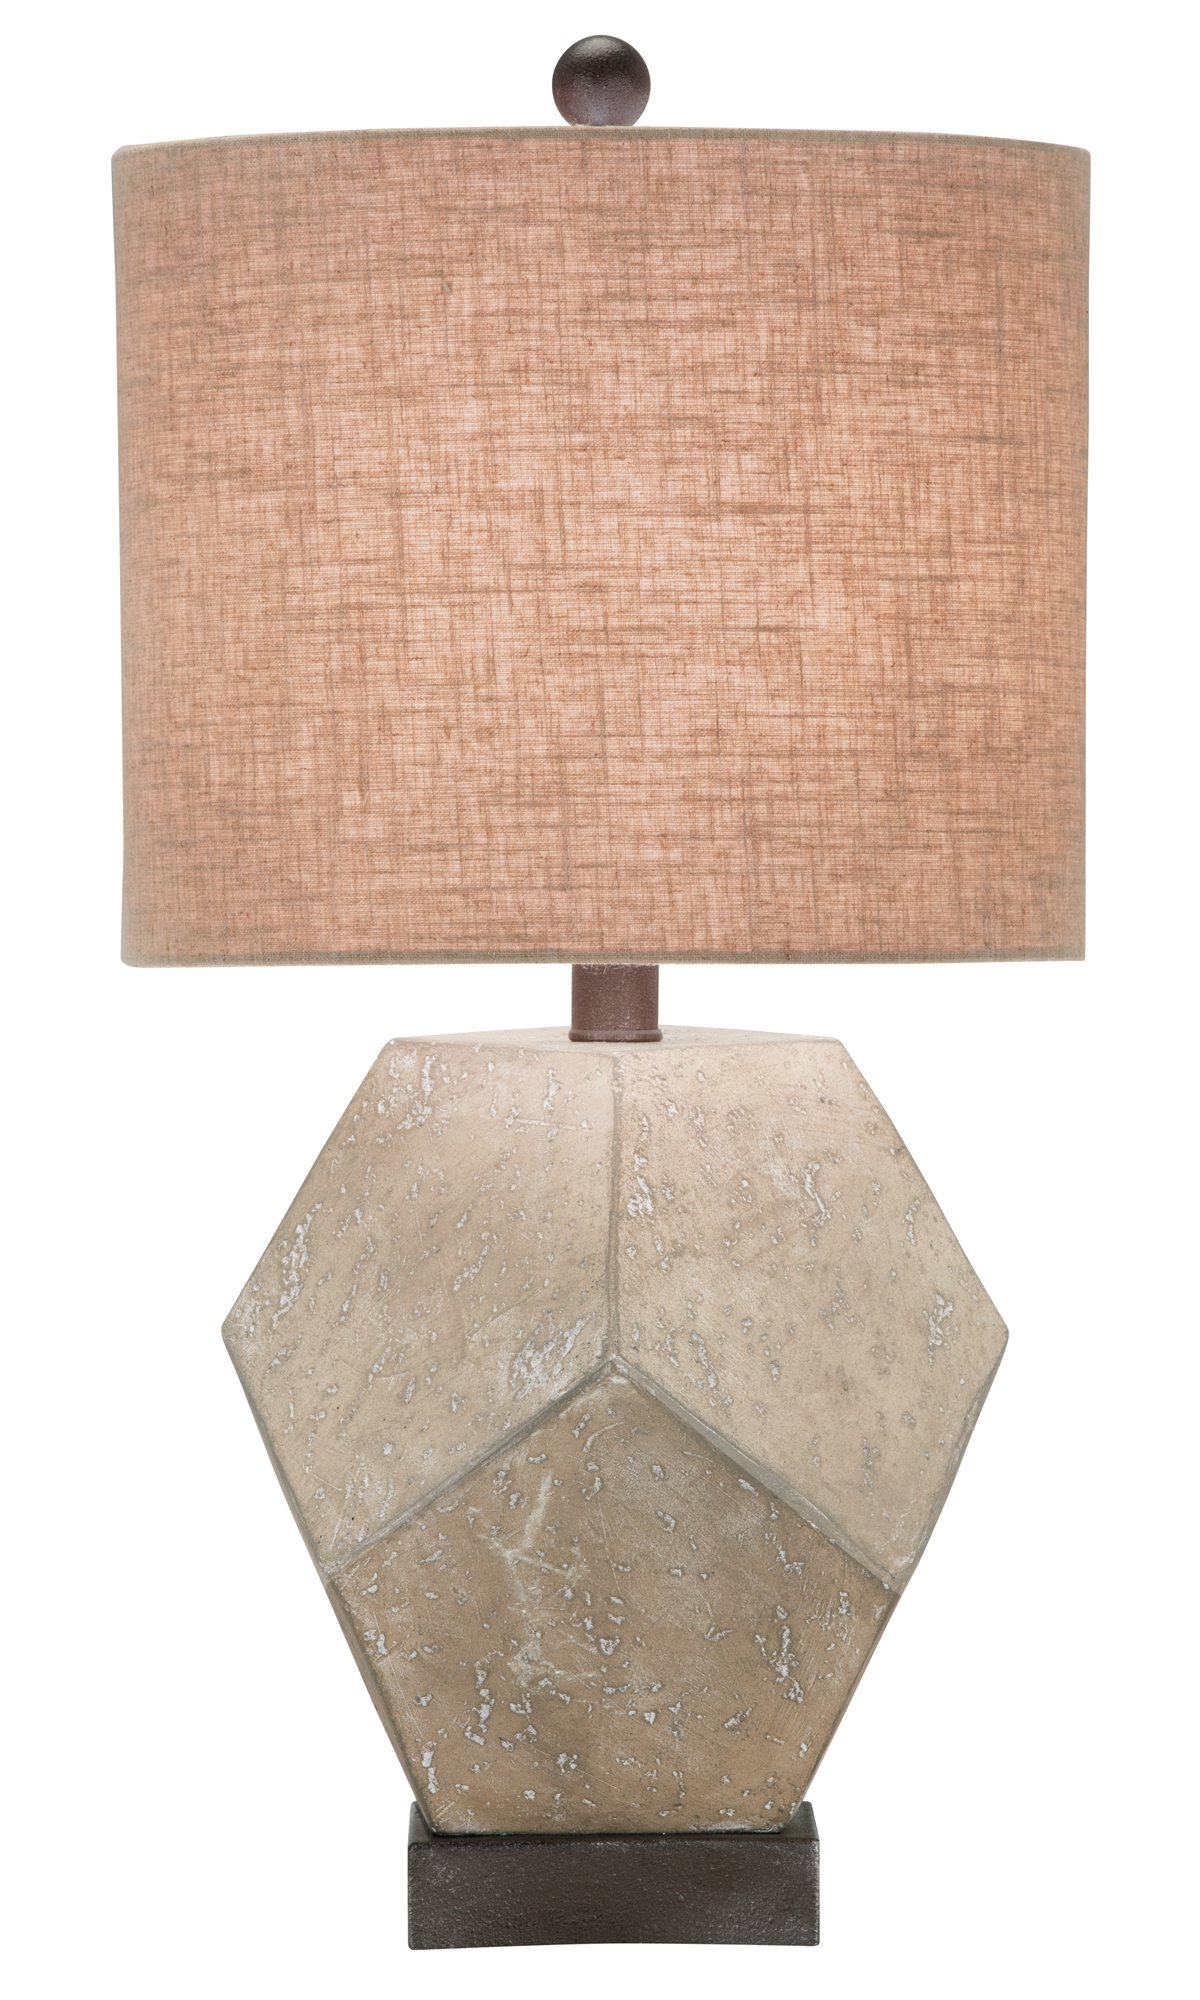 Wallace Gray Table Lamp